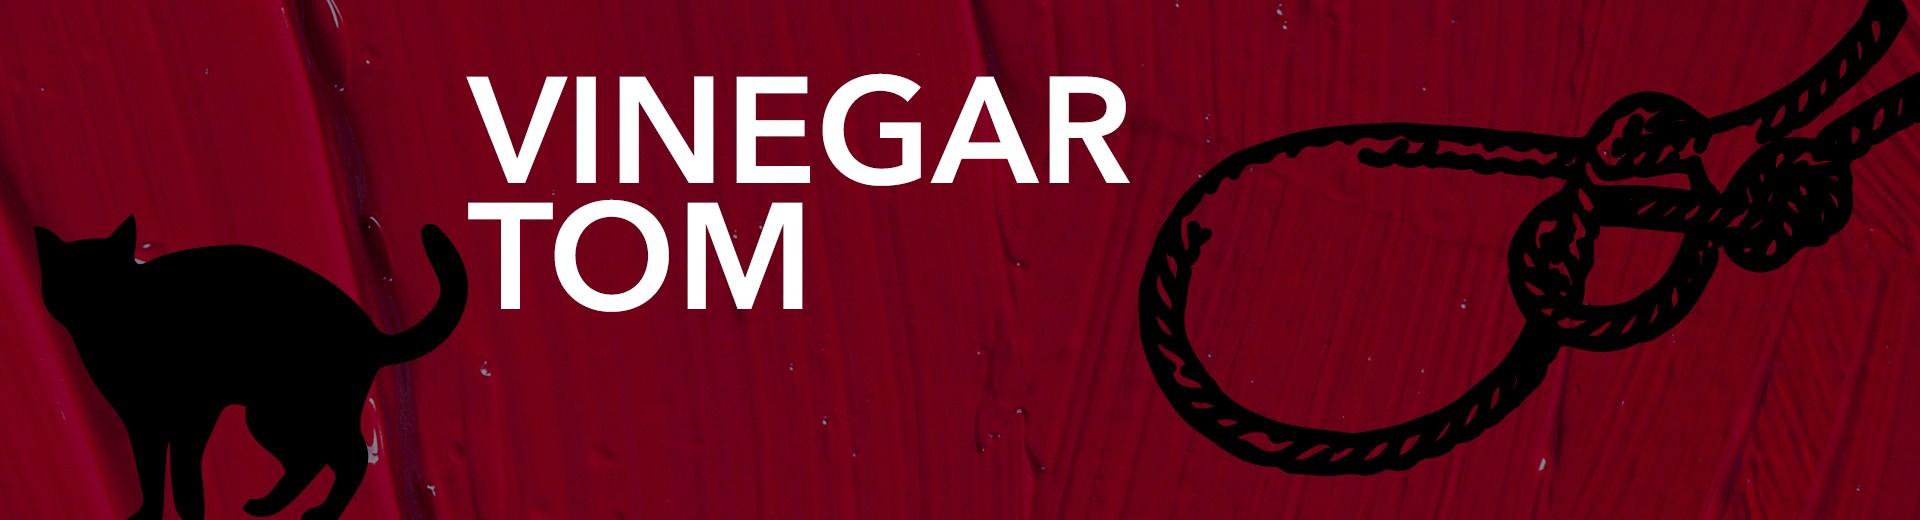 BWW Review: Theatre Cedar Rapids Brings Life to Vinegar Tom